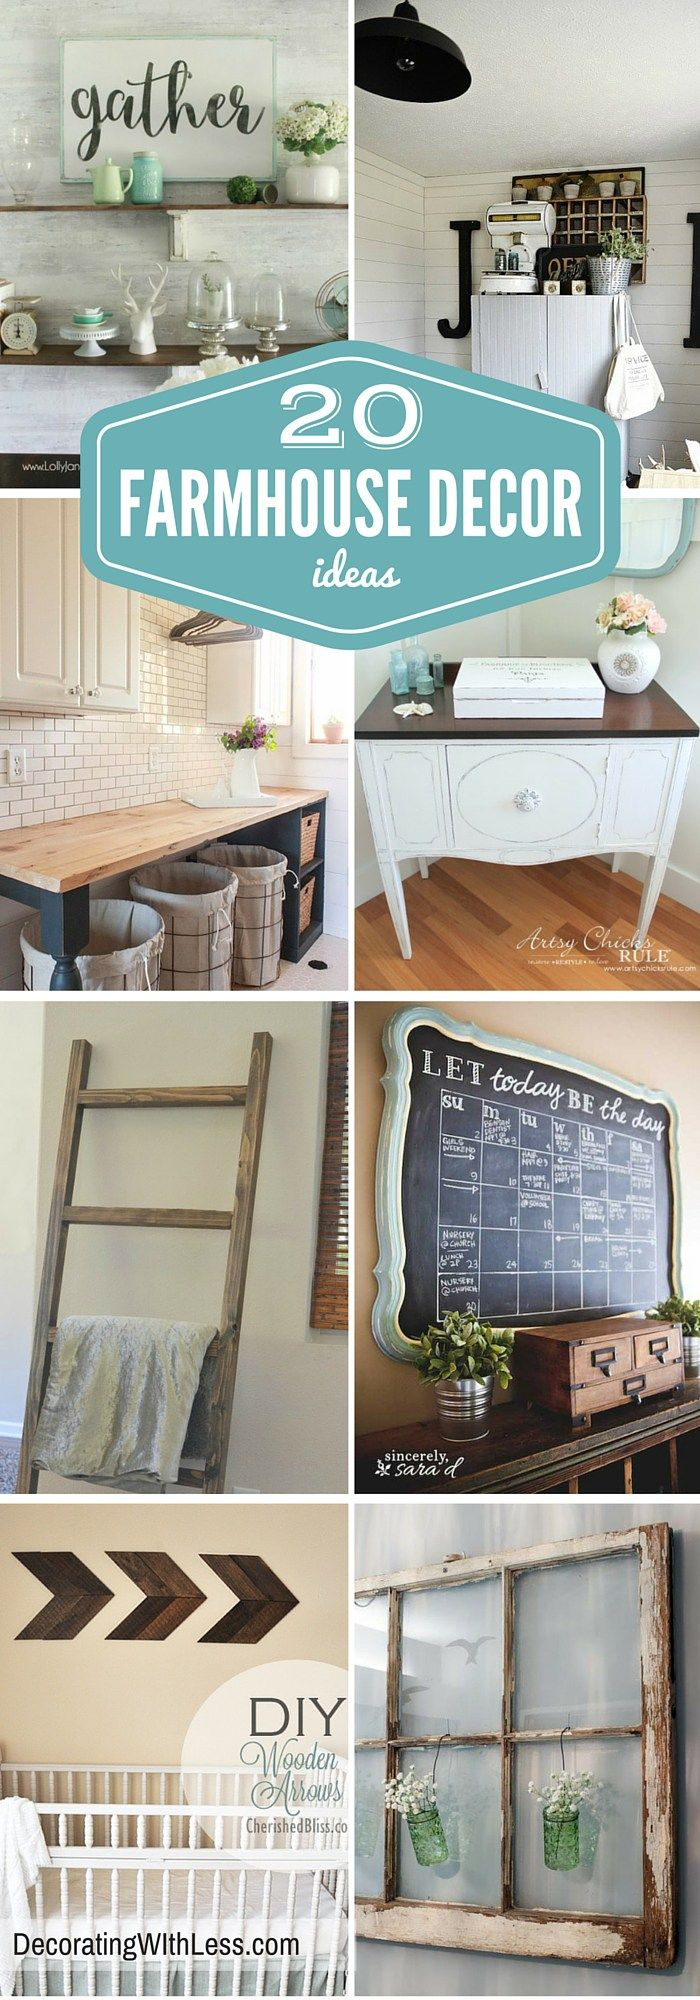 20 Farmhouse Decor Ideas - Decorating With Less